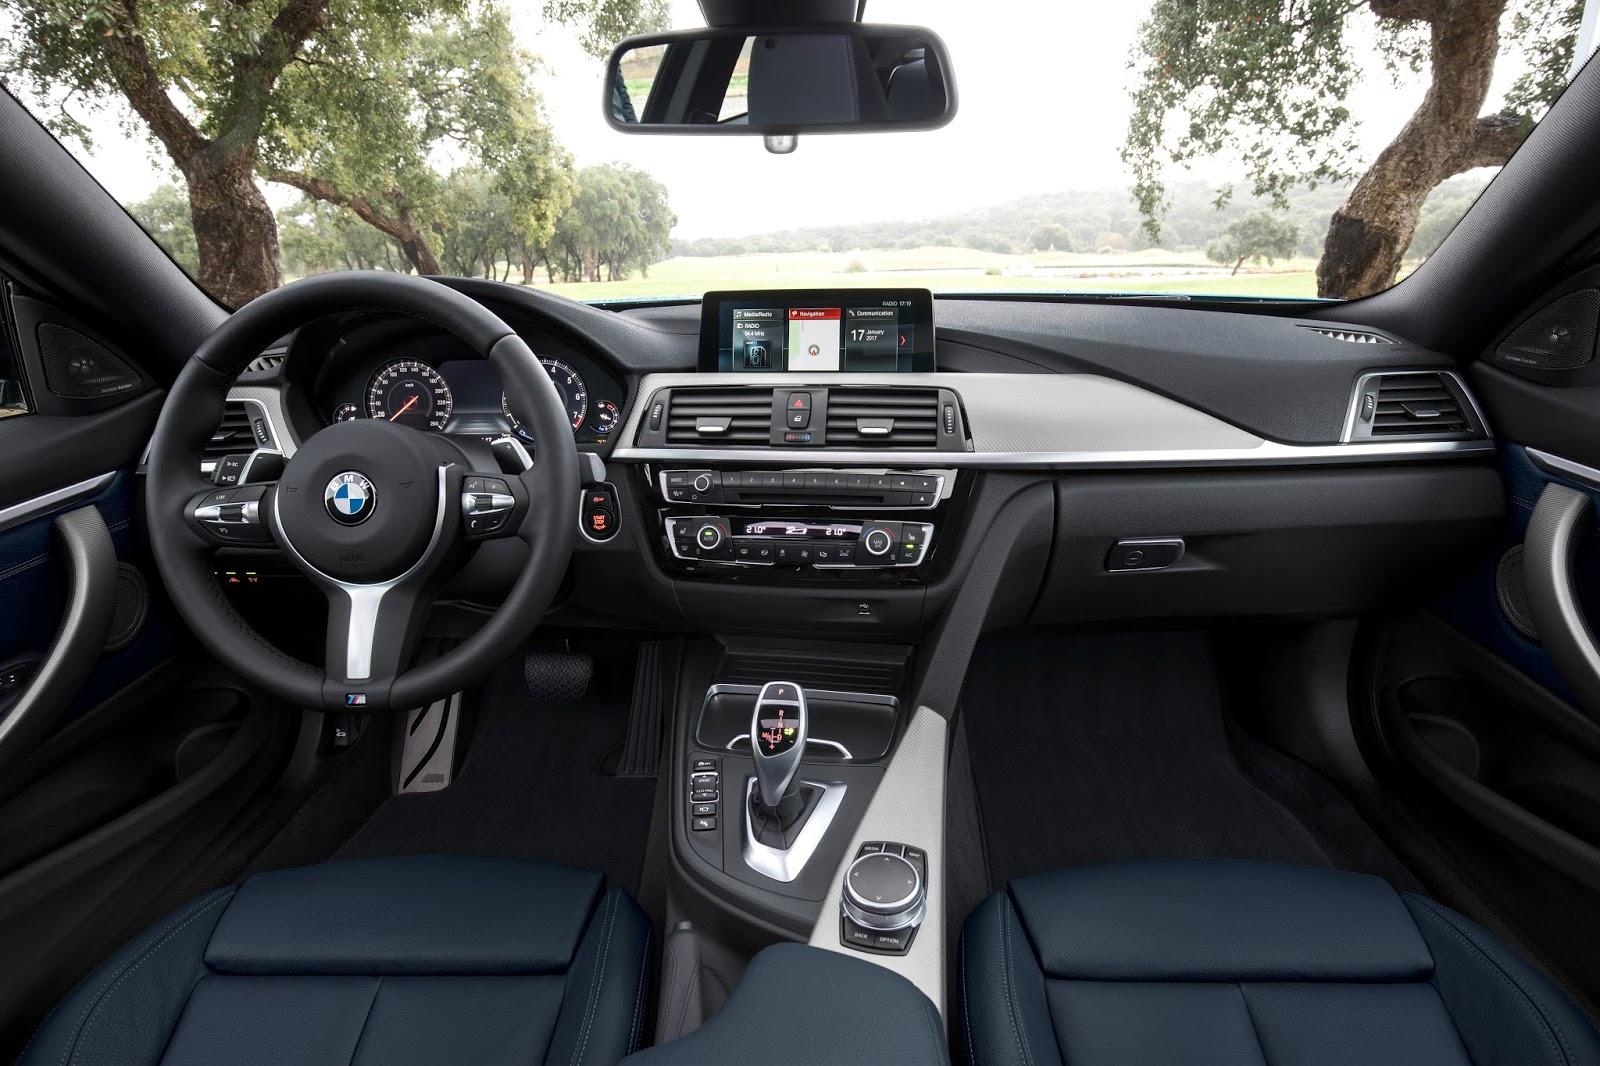 P90245300 highRes the new bmw series i Η νέα BMW Σειρά 4, με πιο σφιχτή ρύθμιση ανάρτησης BMW, Bmw 4, BMW 4 Cabrio, BMW 4 Coupe, BMW 4 Gran Coupé, Facelift